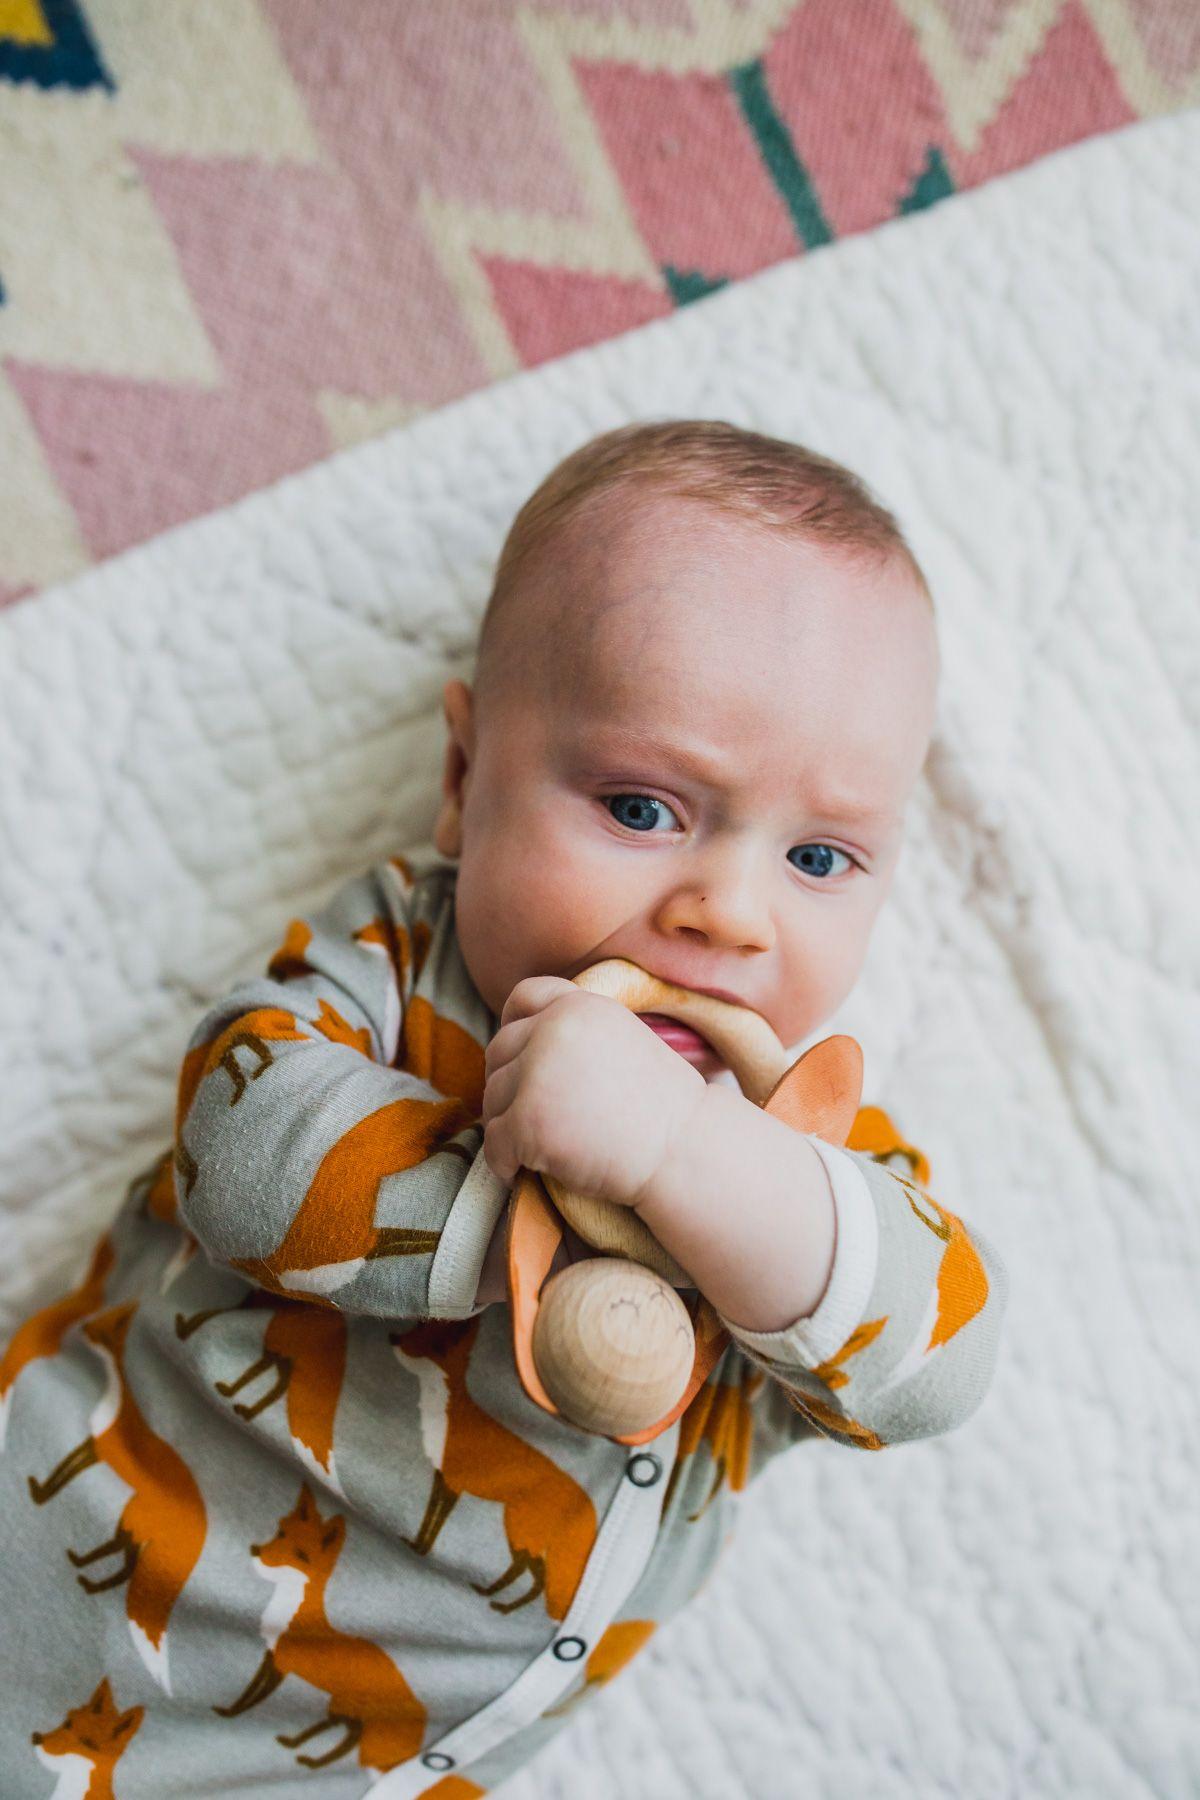 Adorable non toxic baby toys funny babies cute baby